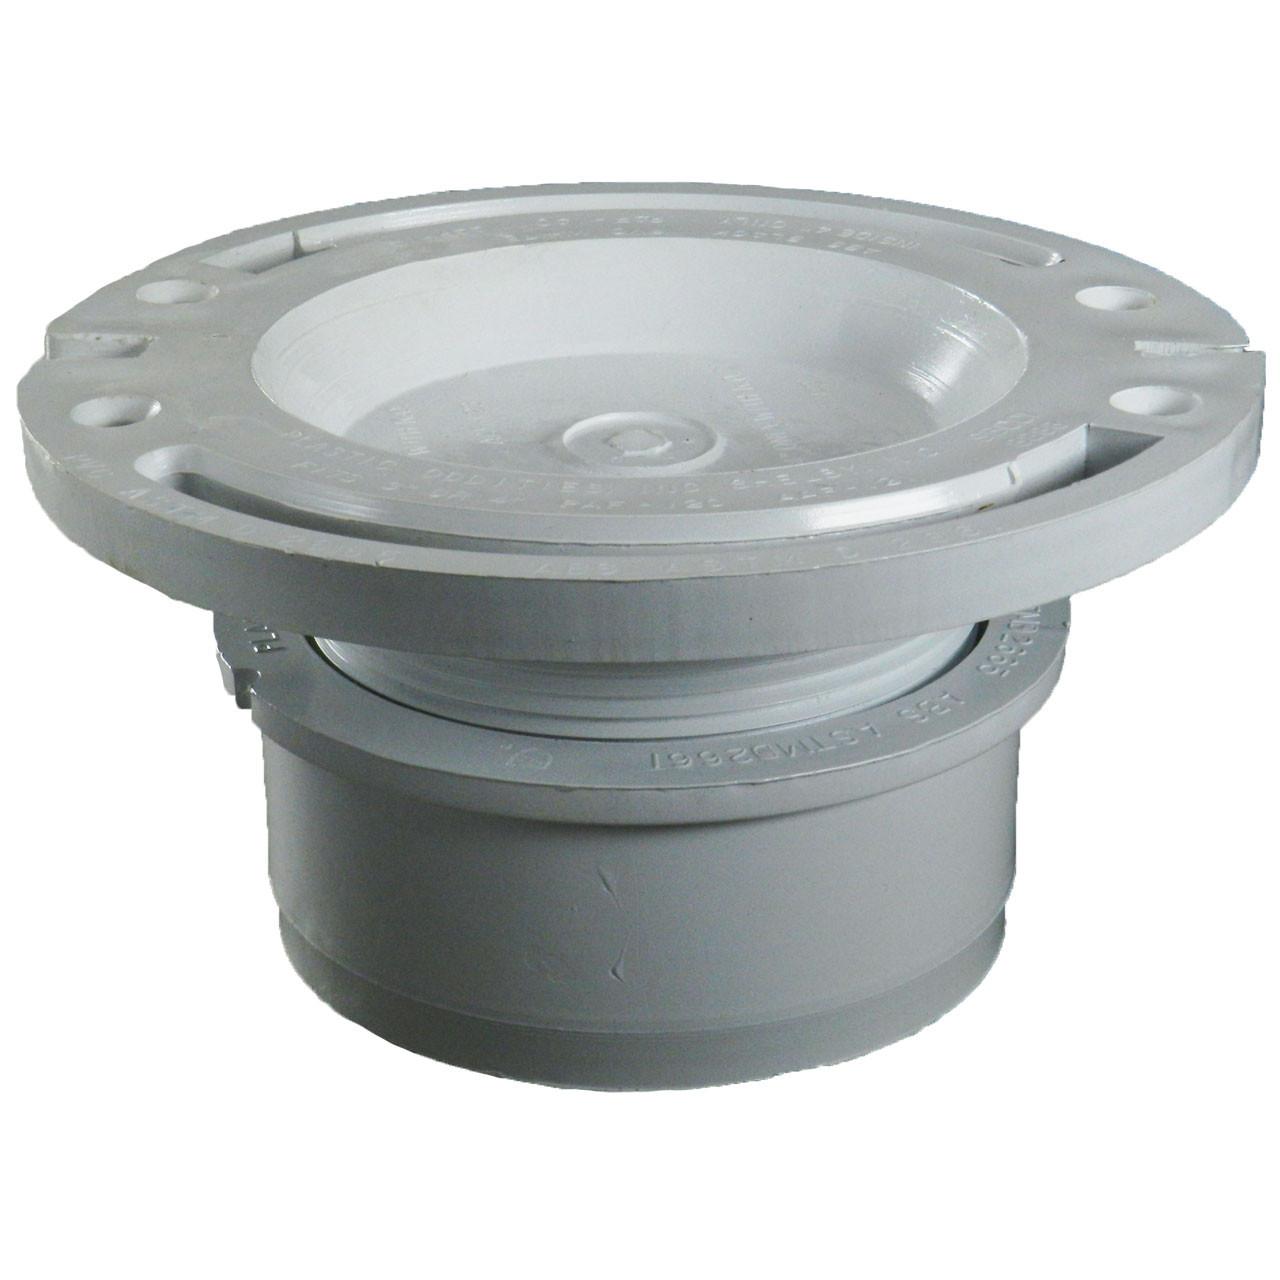 Adjustable Toilet Flange with Knockout